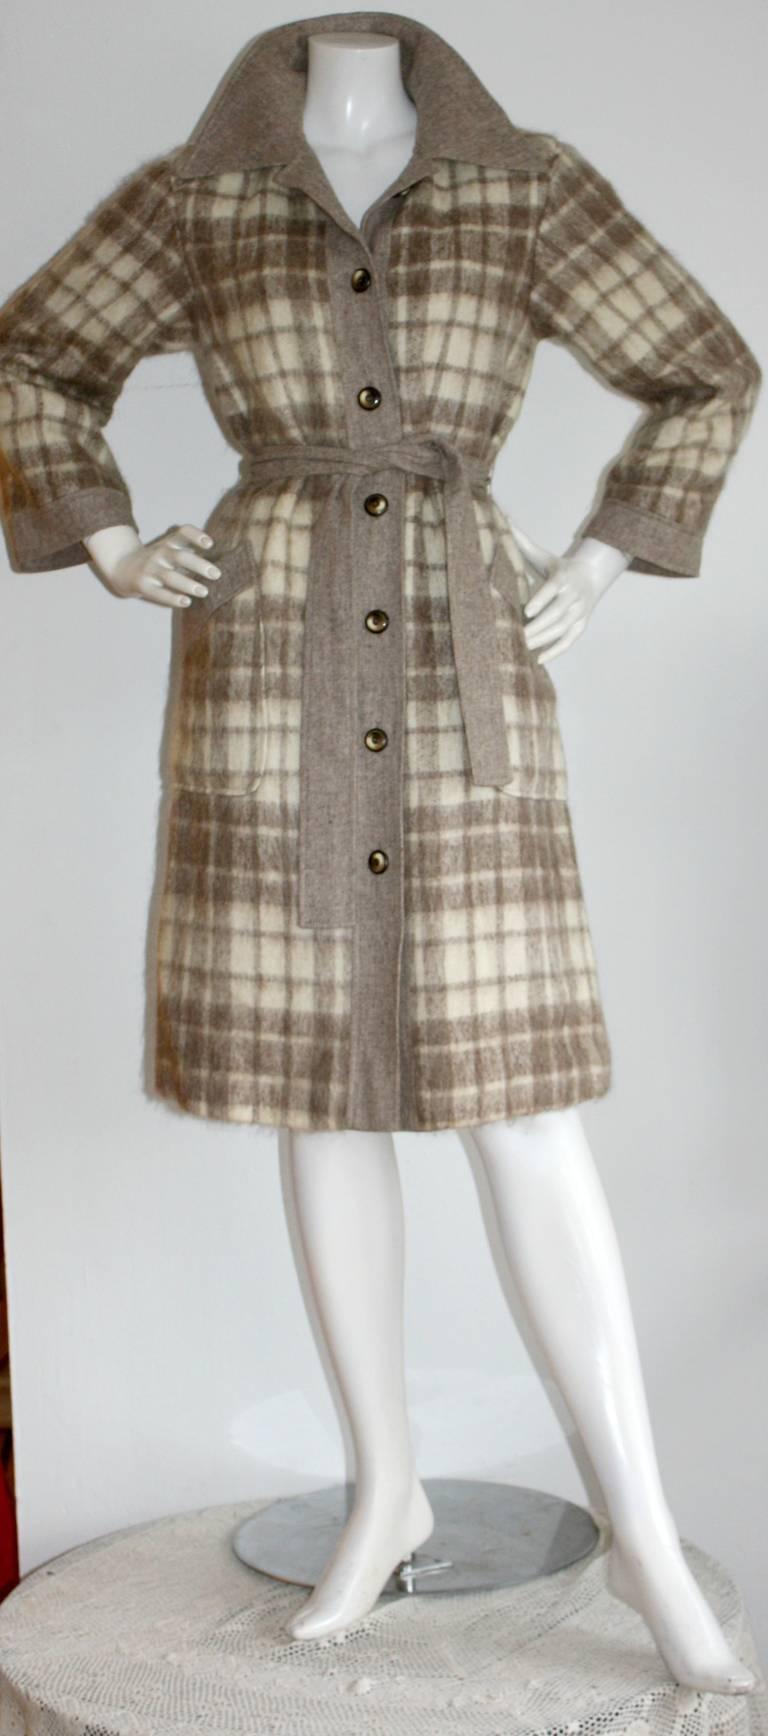 Vintage Pierre Cardin Heathered Camel Tartan Plaid Belted Wool Coat 2